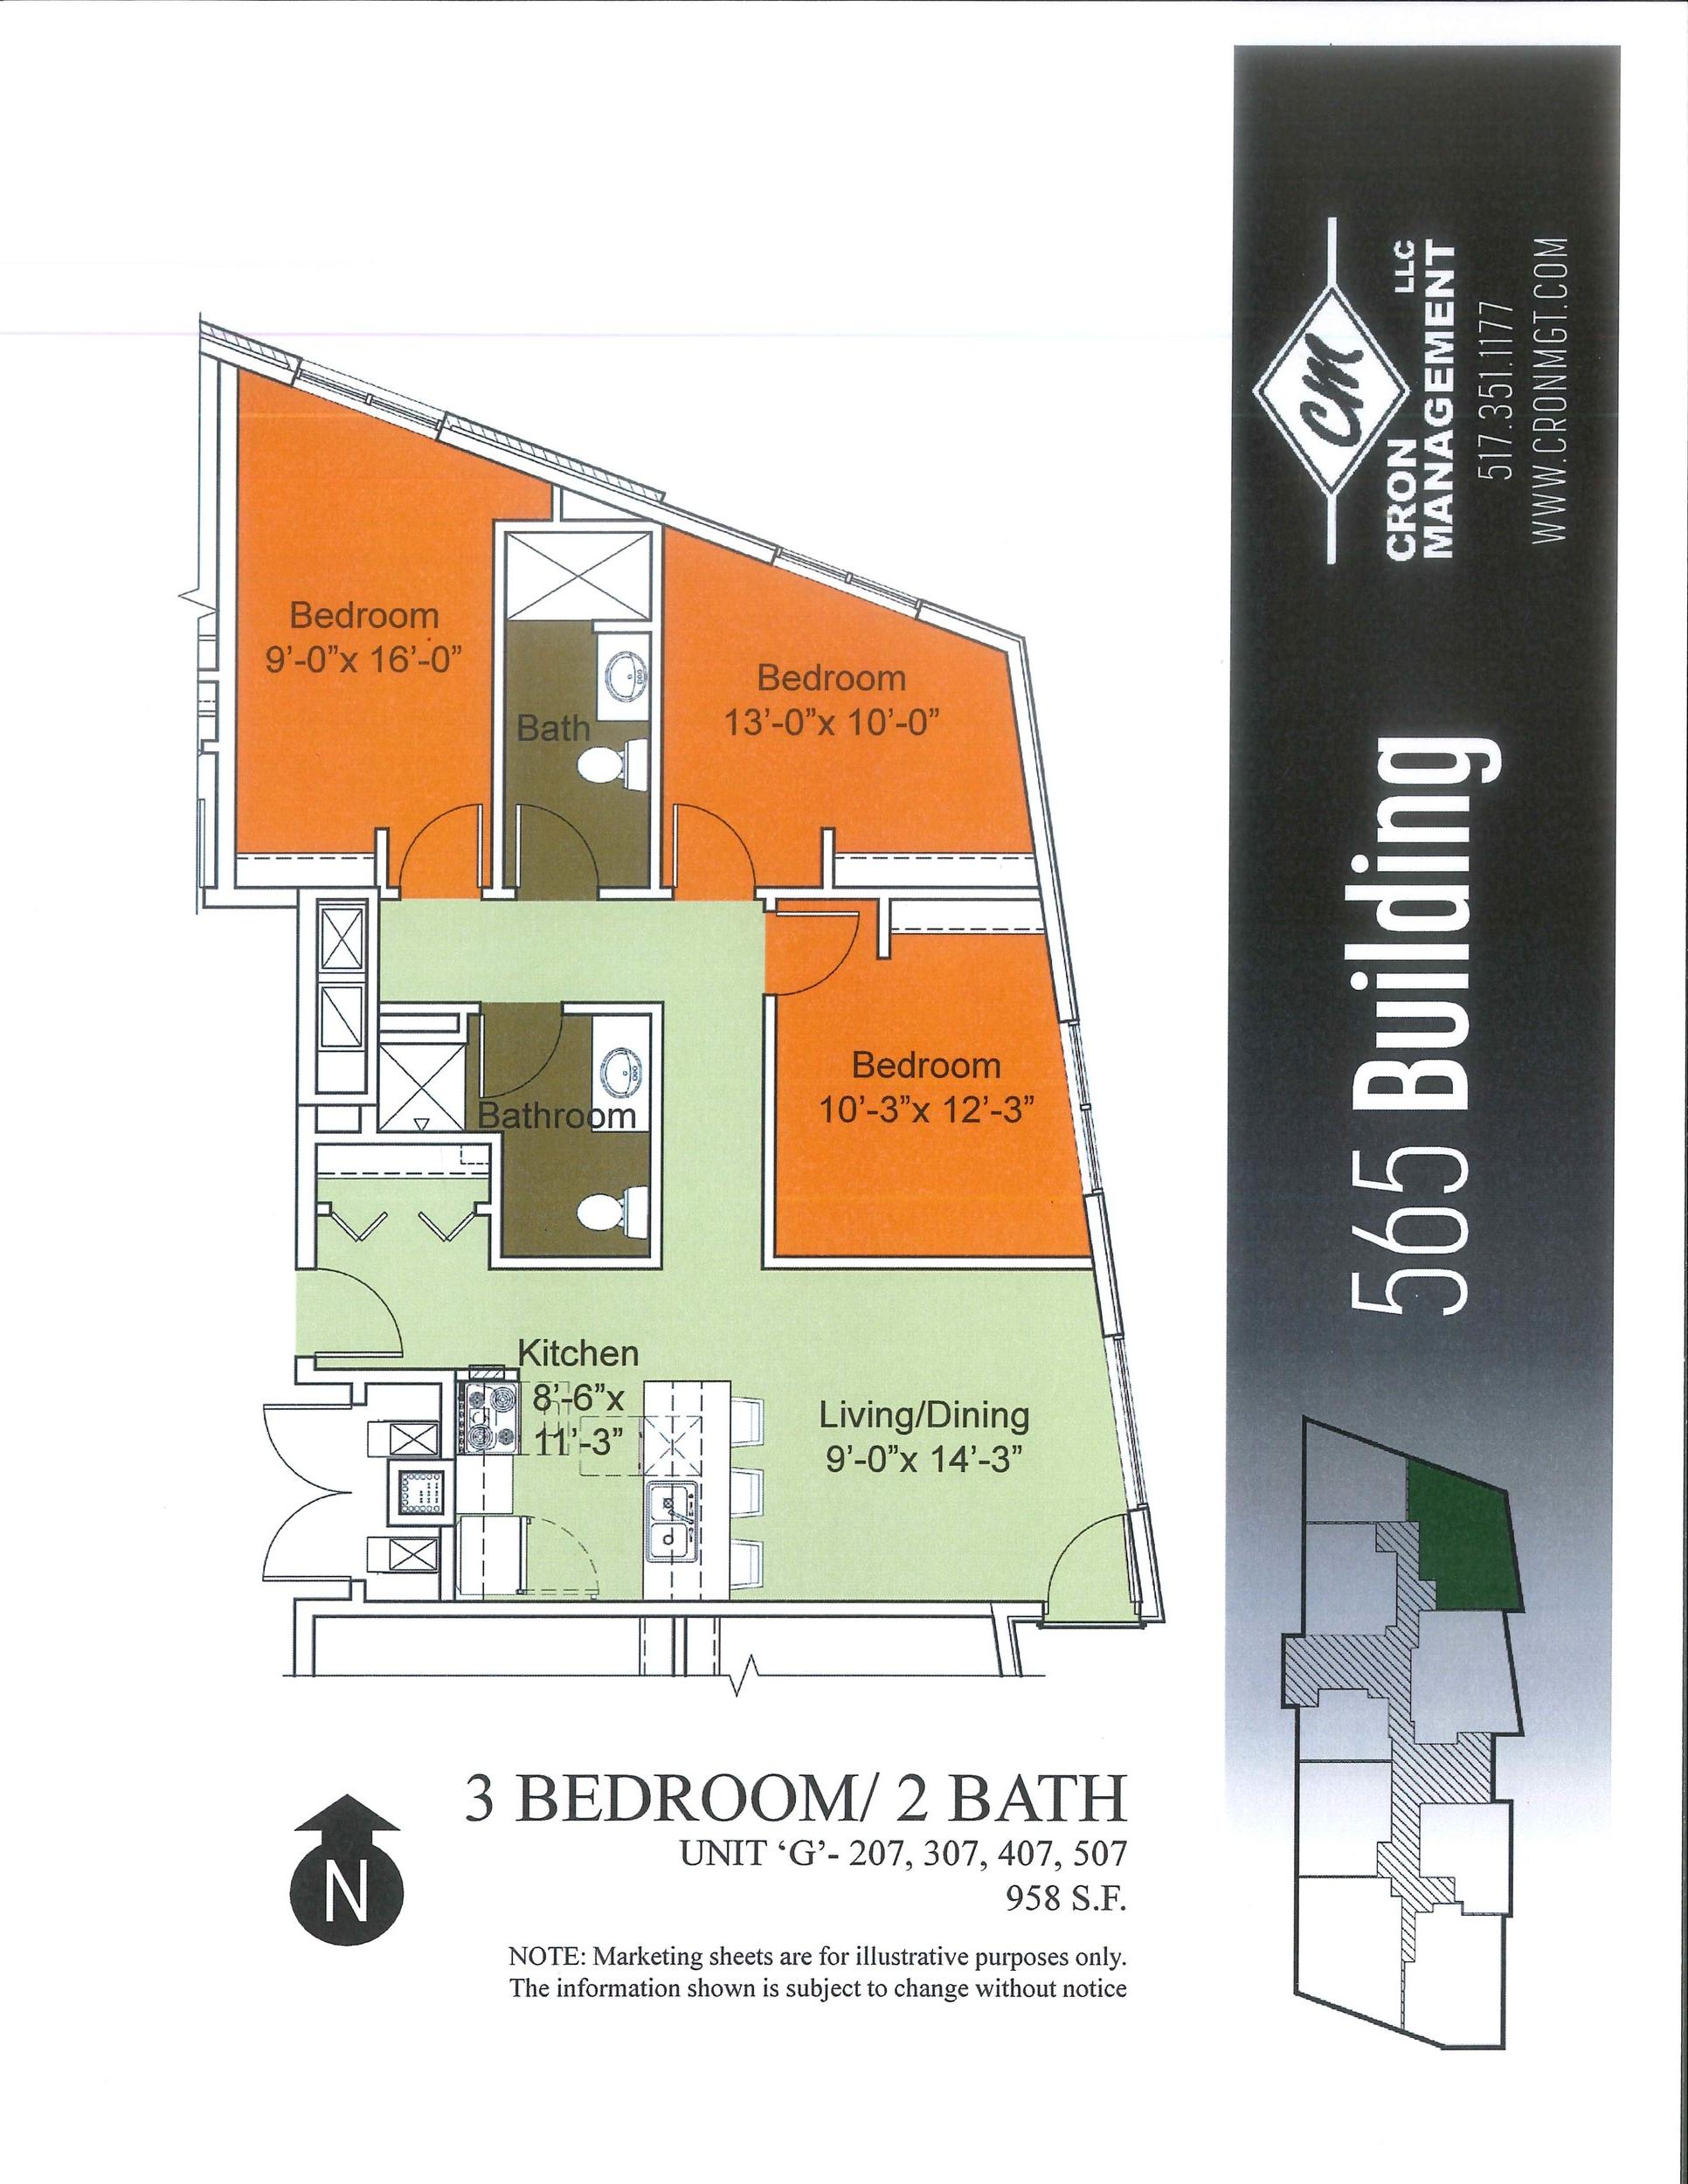 207-507- Three Bedroom